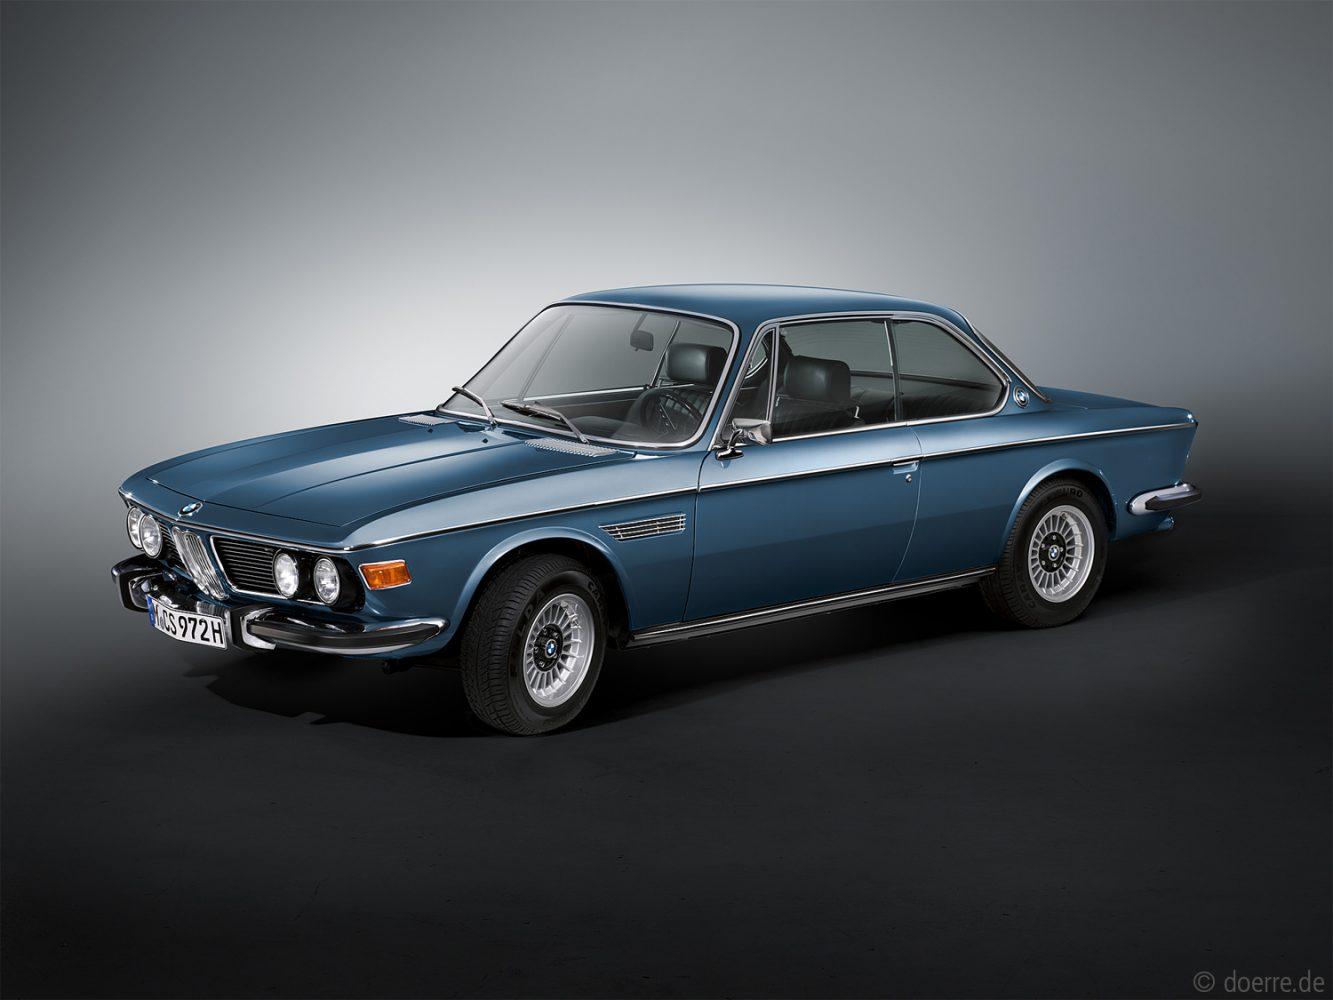 BMW CSI 3.0 Baujahr 1972